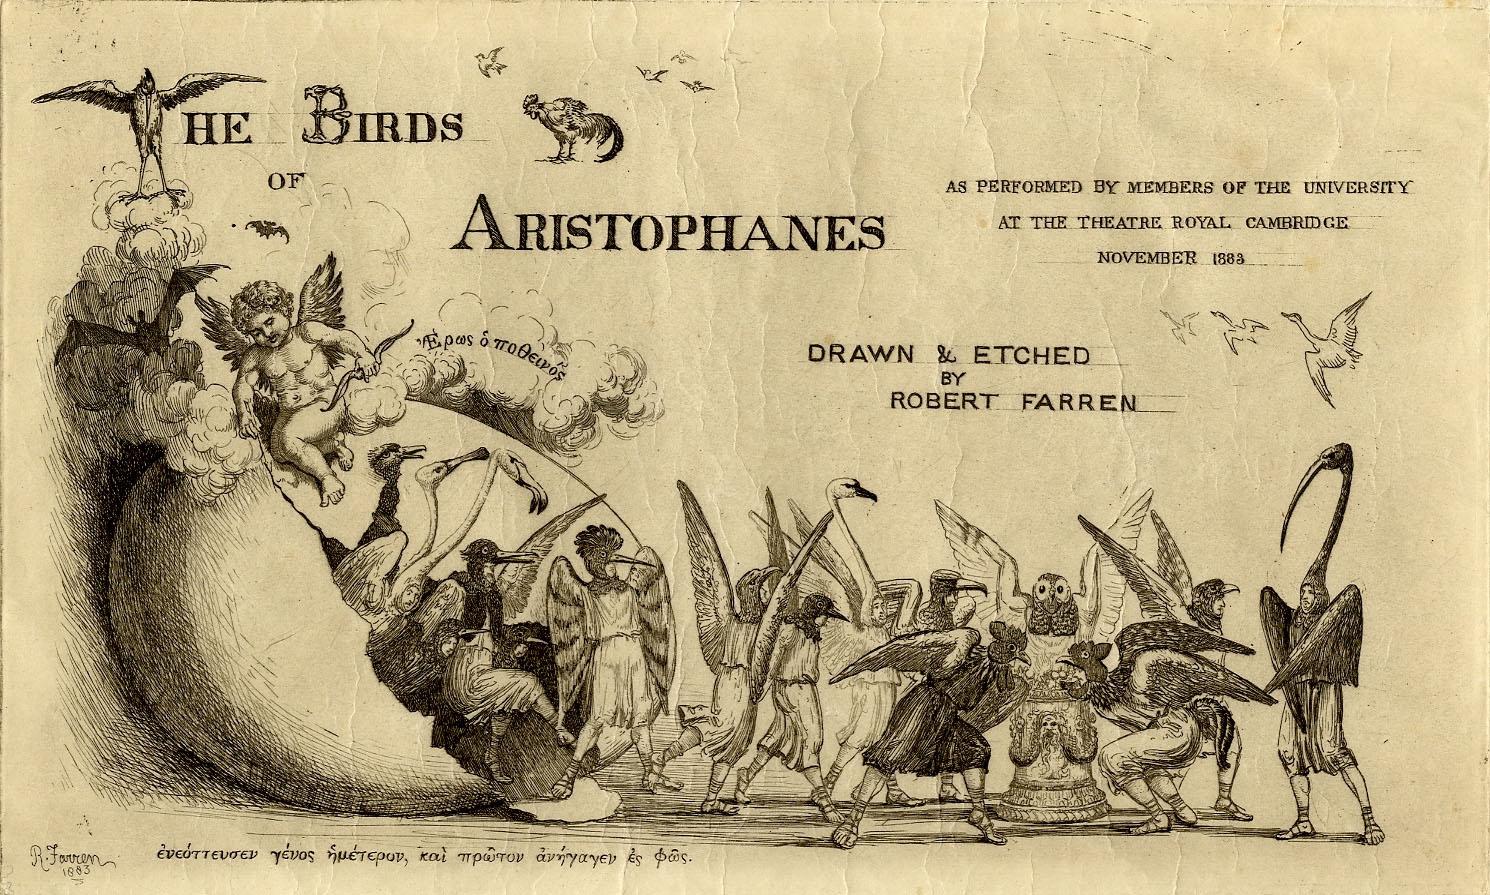 The Birds of Aristophanes title sheet, 1883 (KCAS/36/1883)